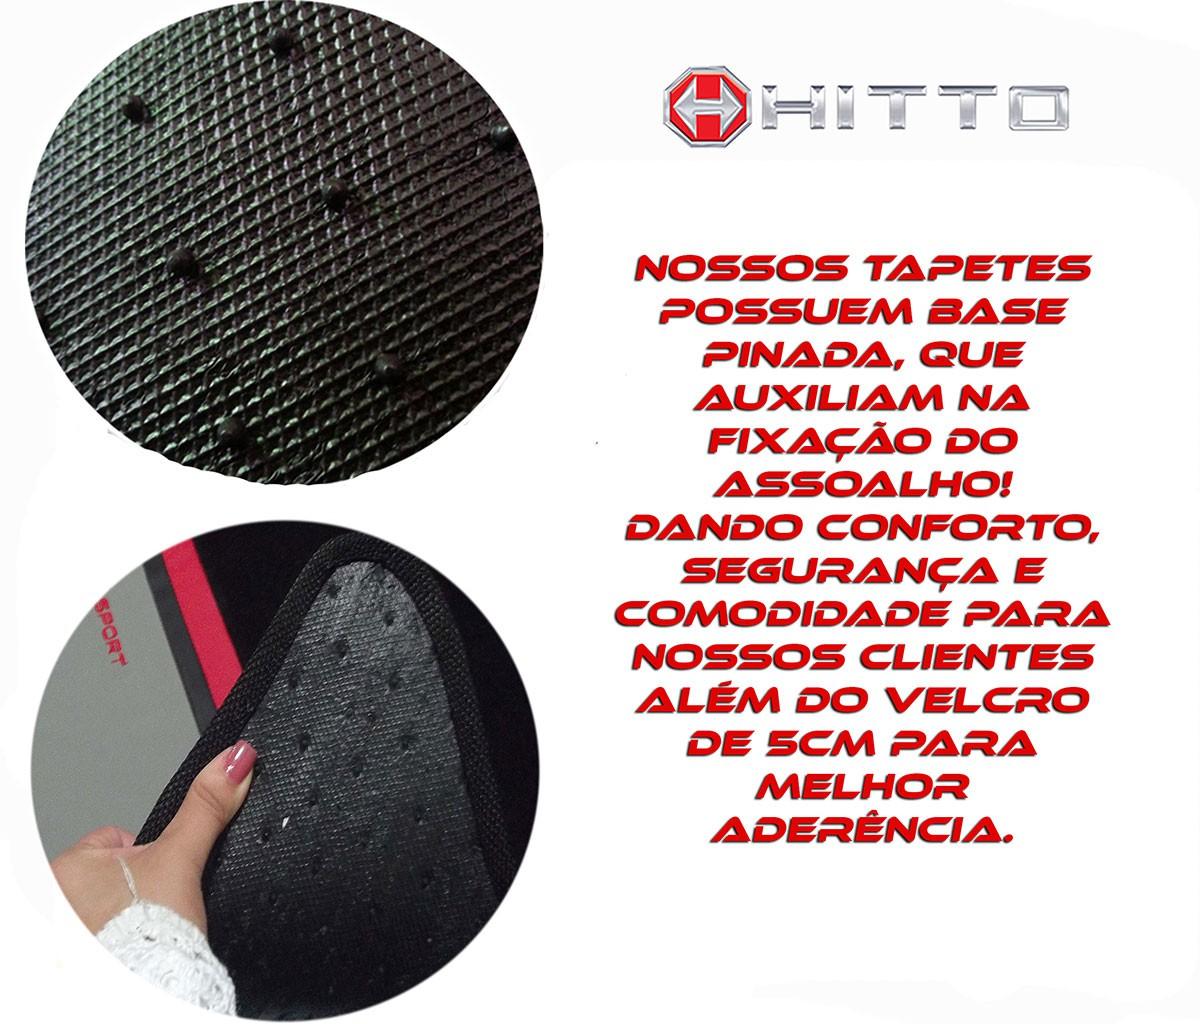 Tapete Astra Gsi 16v Carpete Luxo Base Borracha Pinada